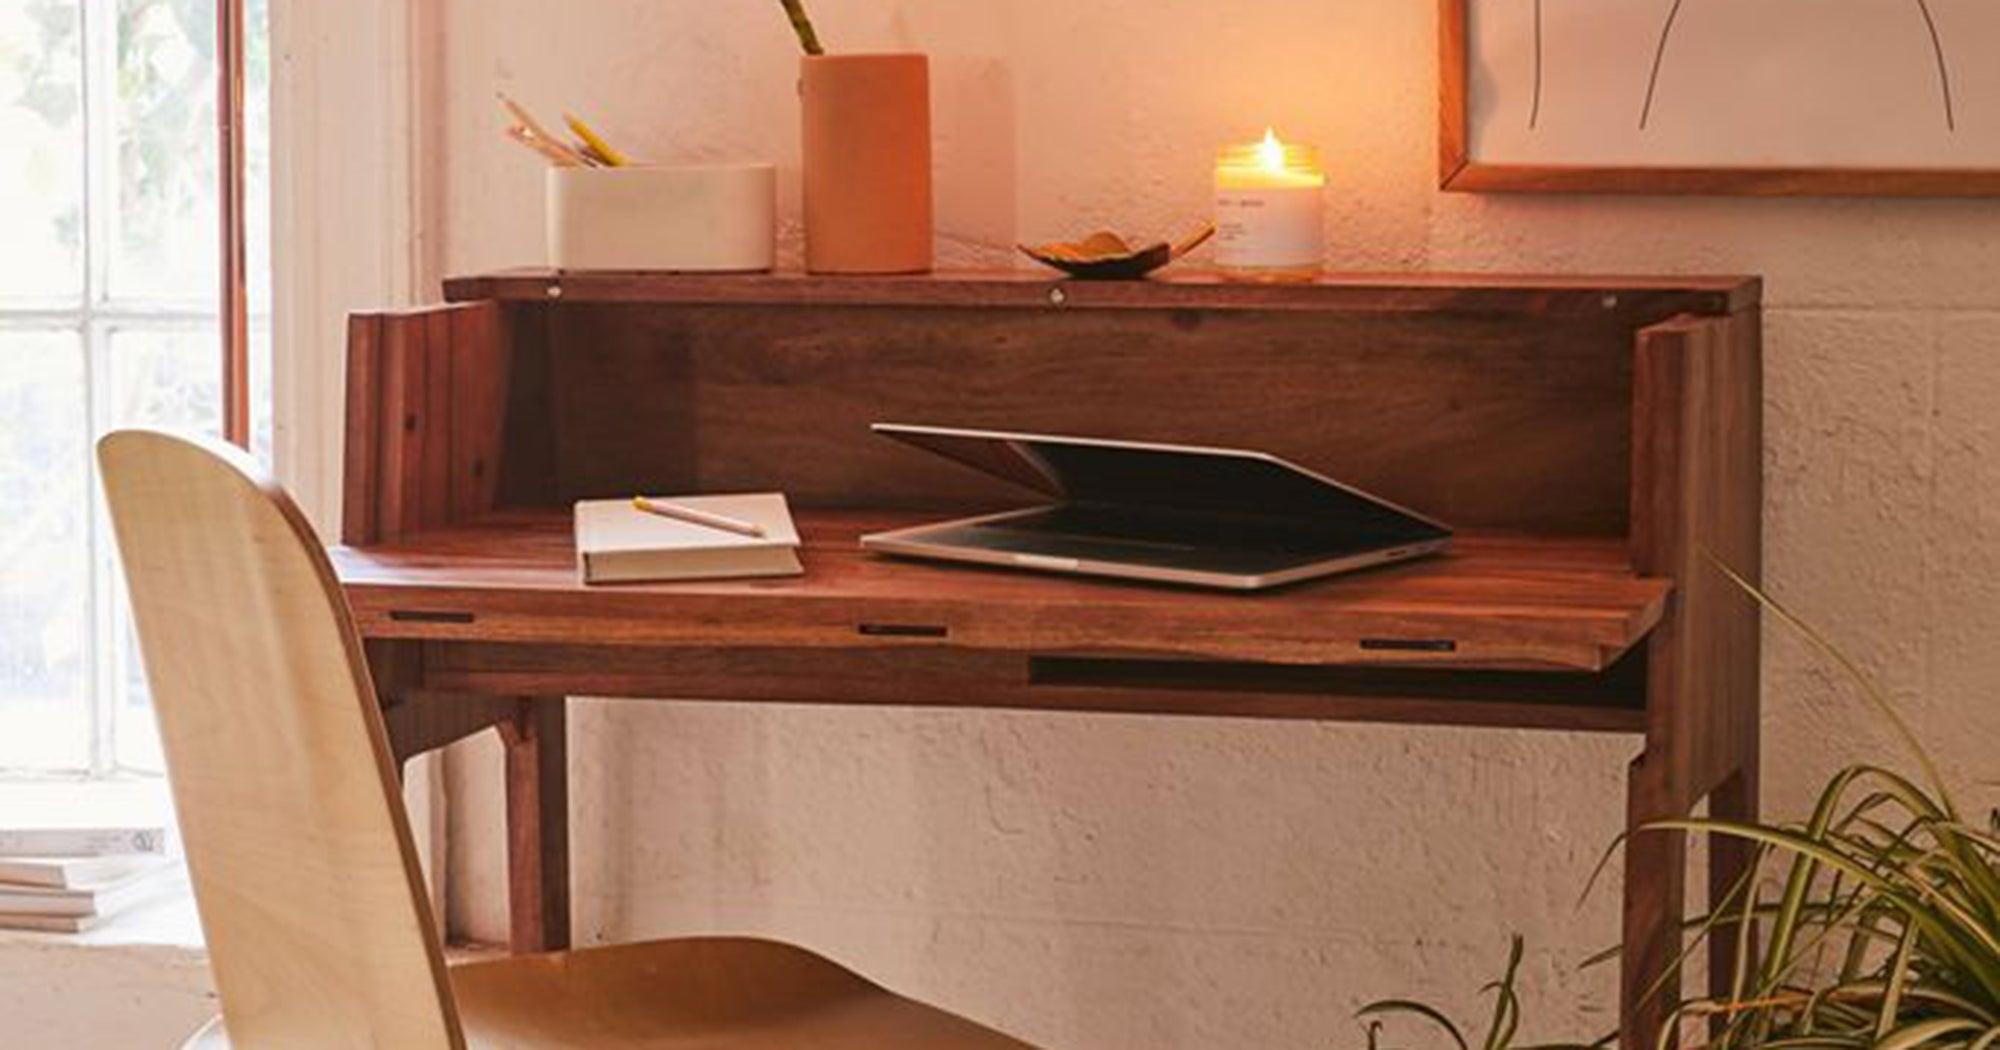 best folding desk utm source=feed&utm medium=rss